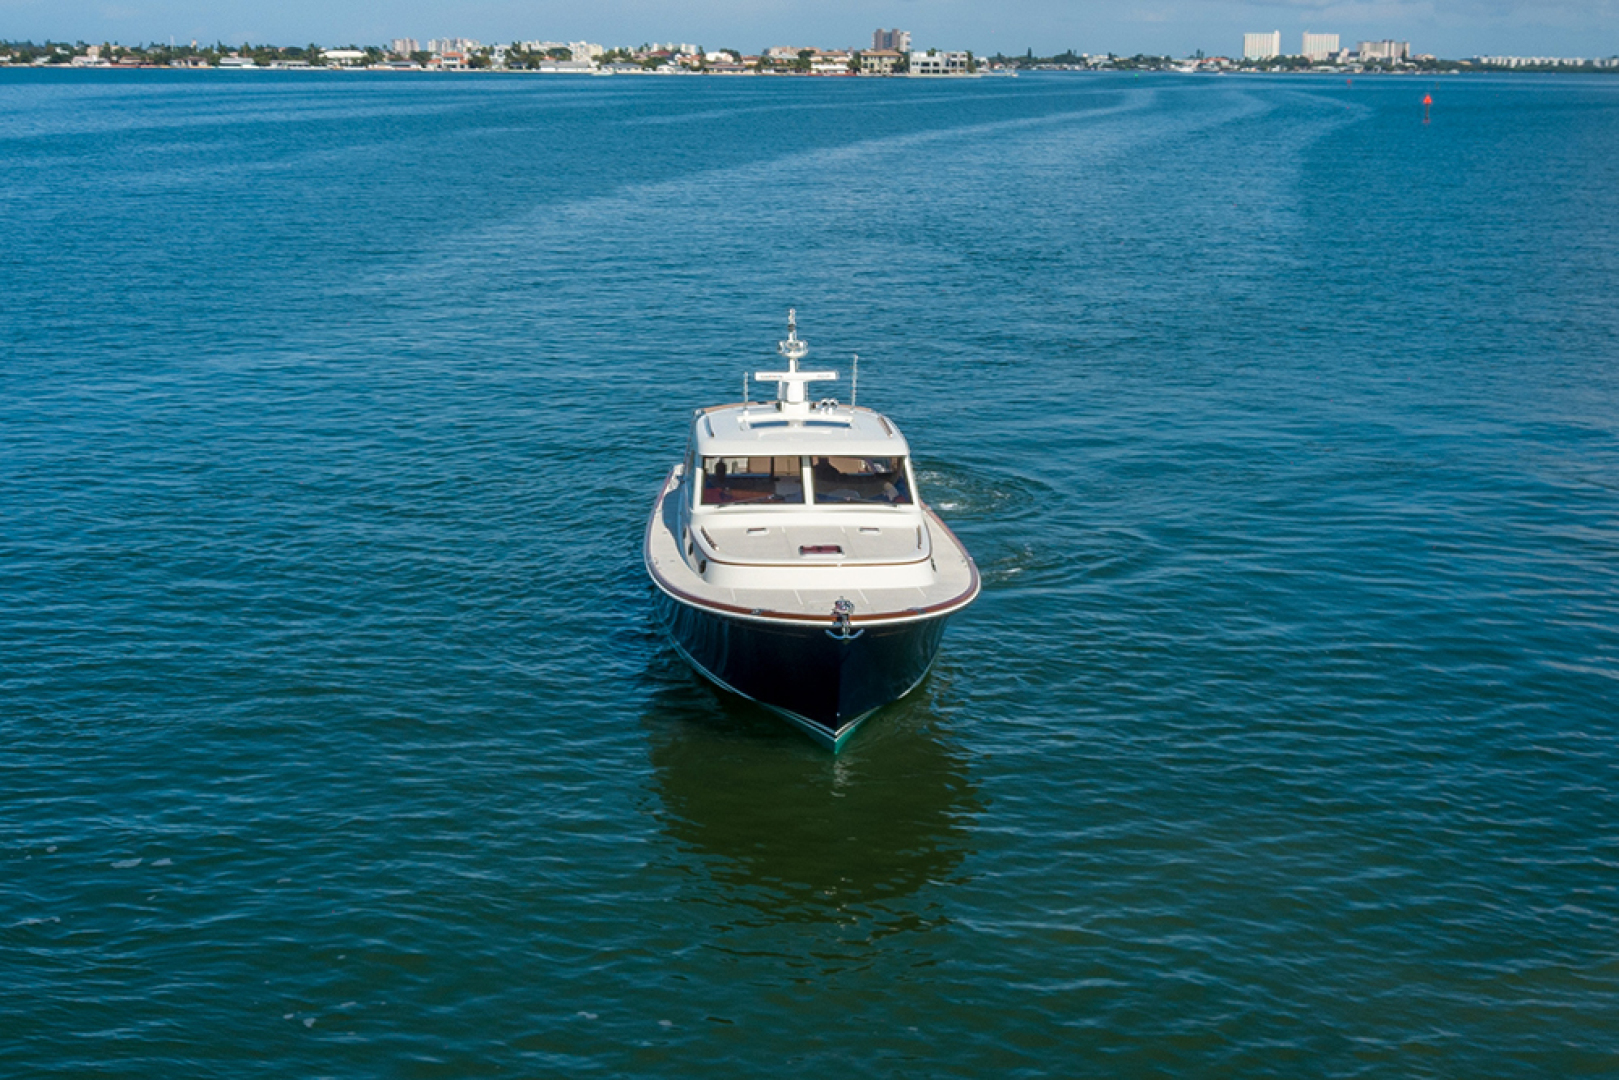 San Juan-SJ48 Express 2006 FEARLESS Saint Petersburg-Florida-United States-Bow profile-1508116 | Thumbnail